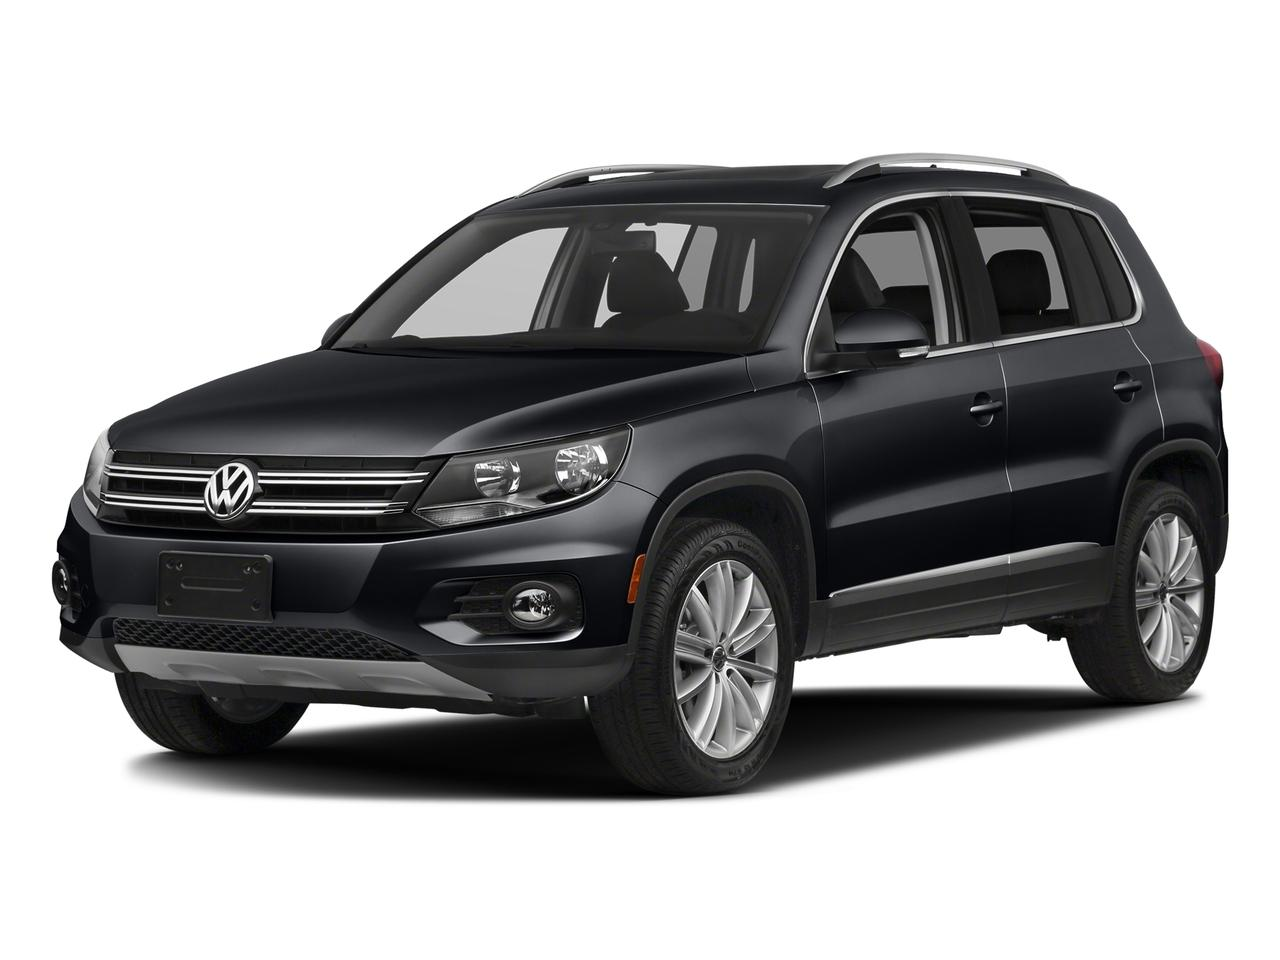 2018 Volkswagen Tiguan Limited Vehicle Photo in Joliet, IL 60586